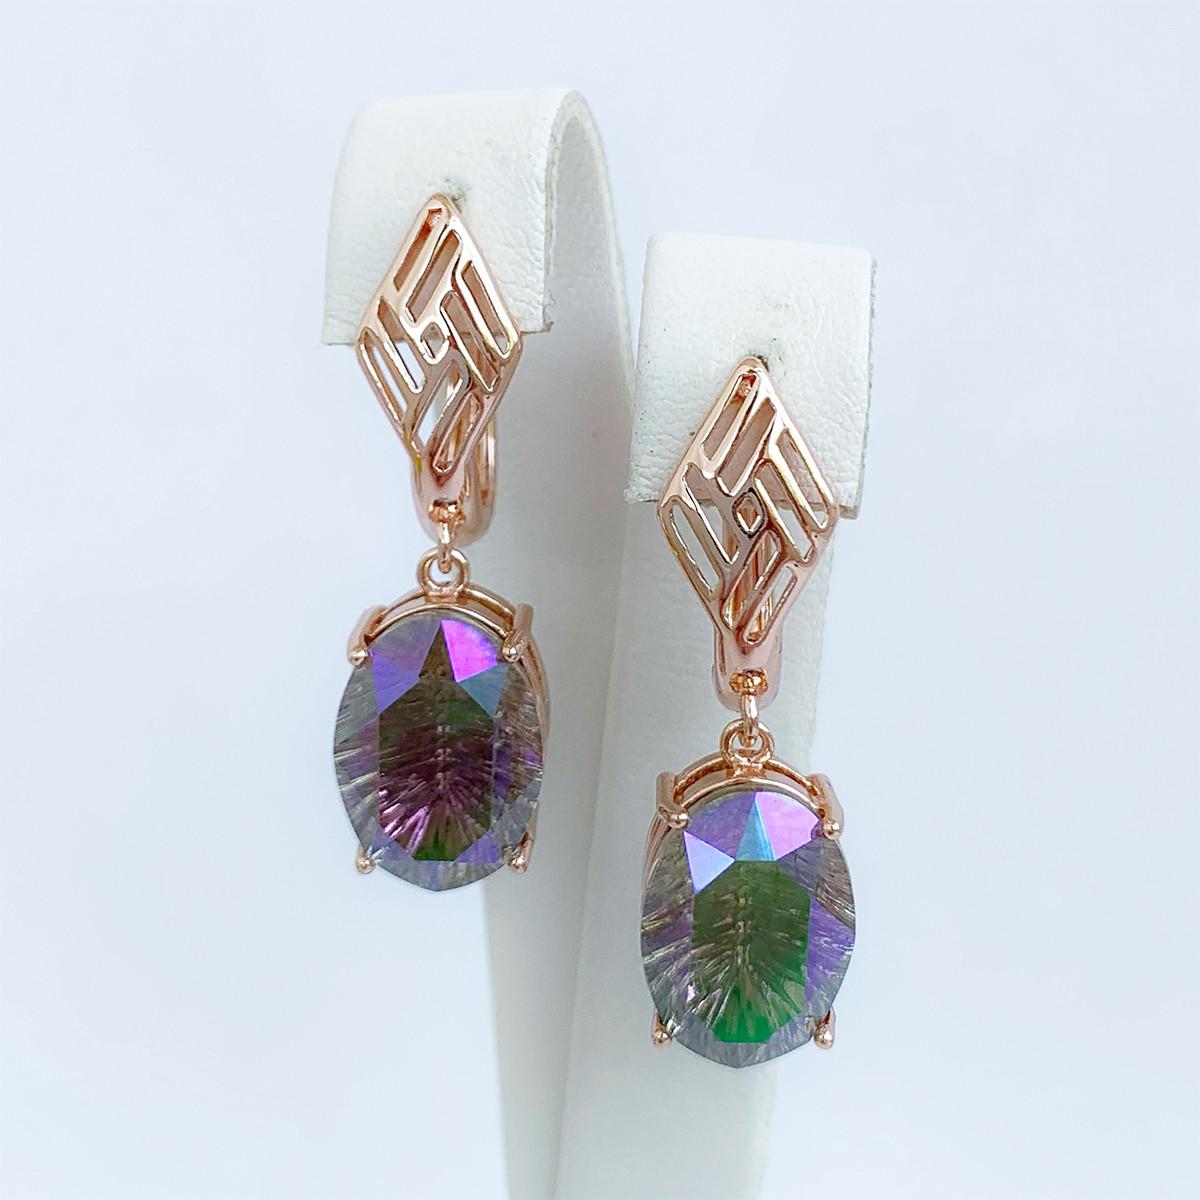 Серьги SONATA из медицинского золота, кристаллы Swarovski зелено-розового цвета, позолота PO, 25695